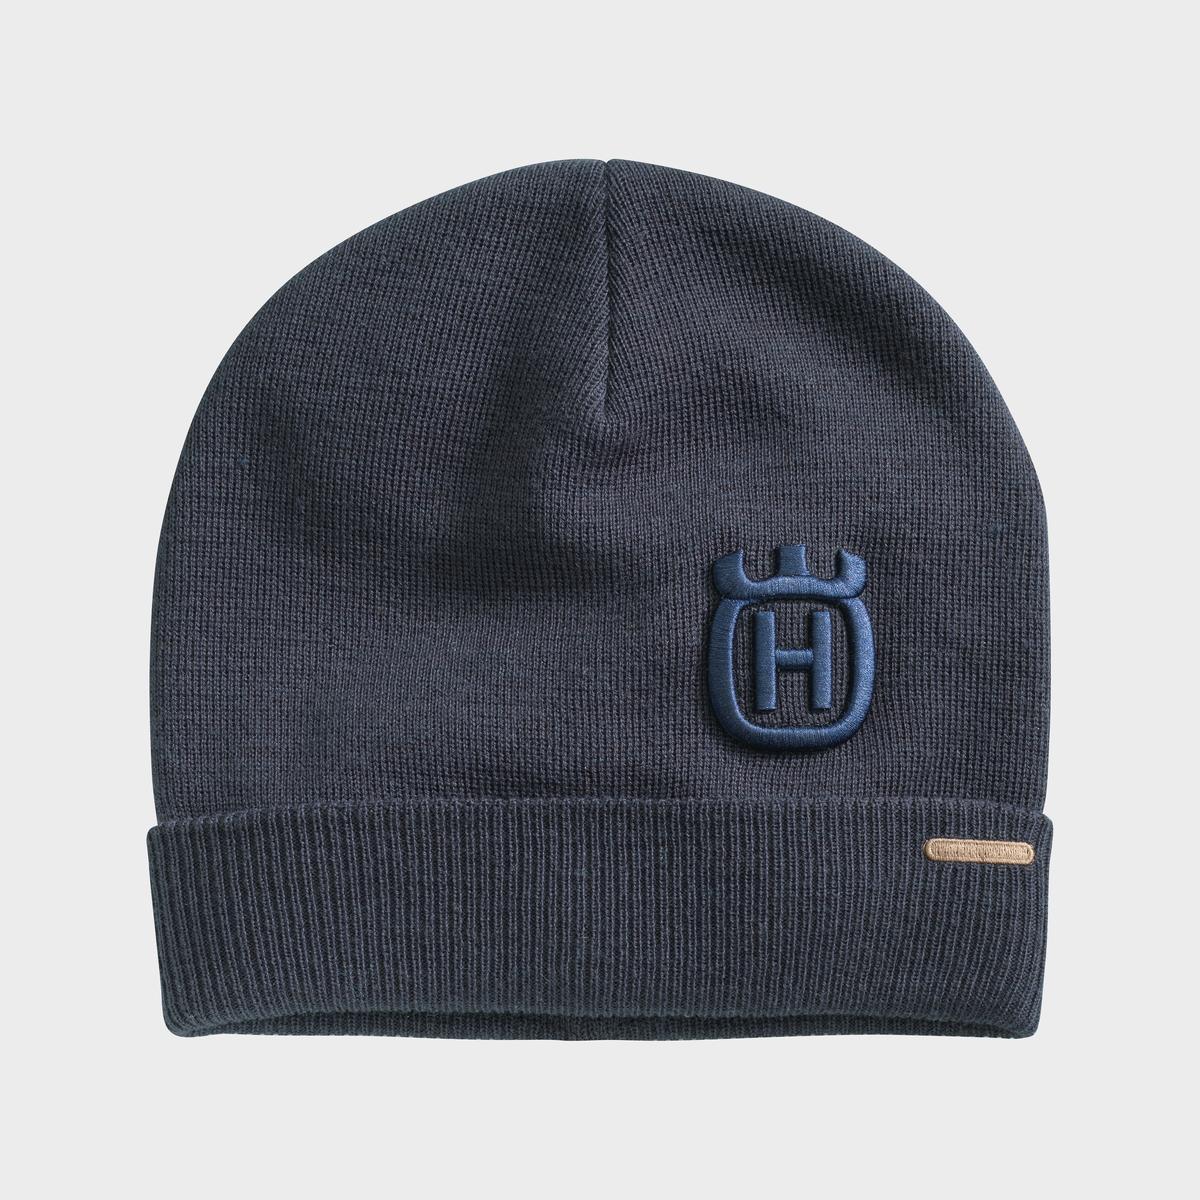 Husqvarna Logo Beanie / Hat (One Size)